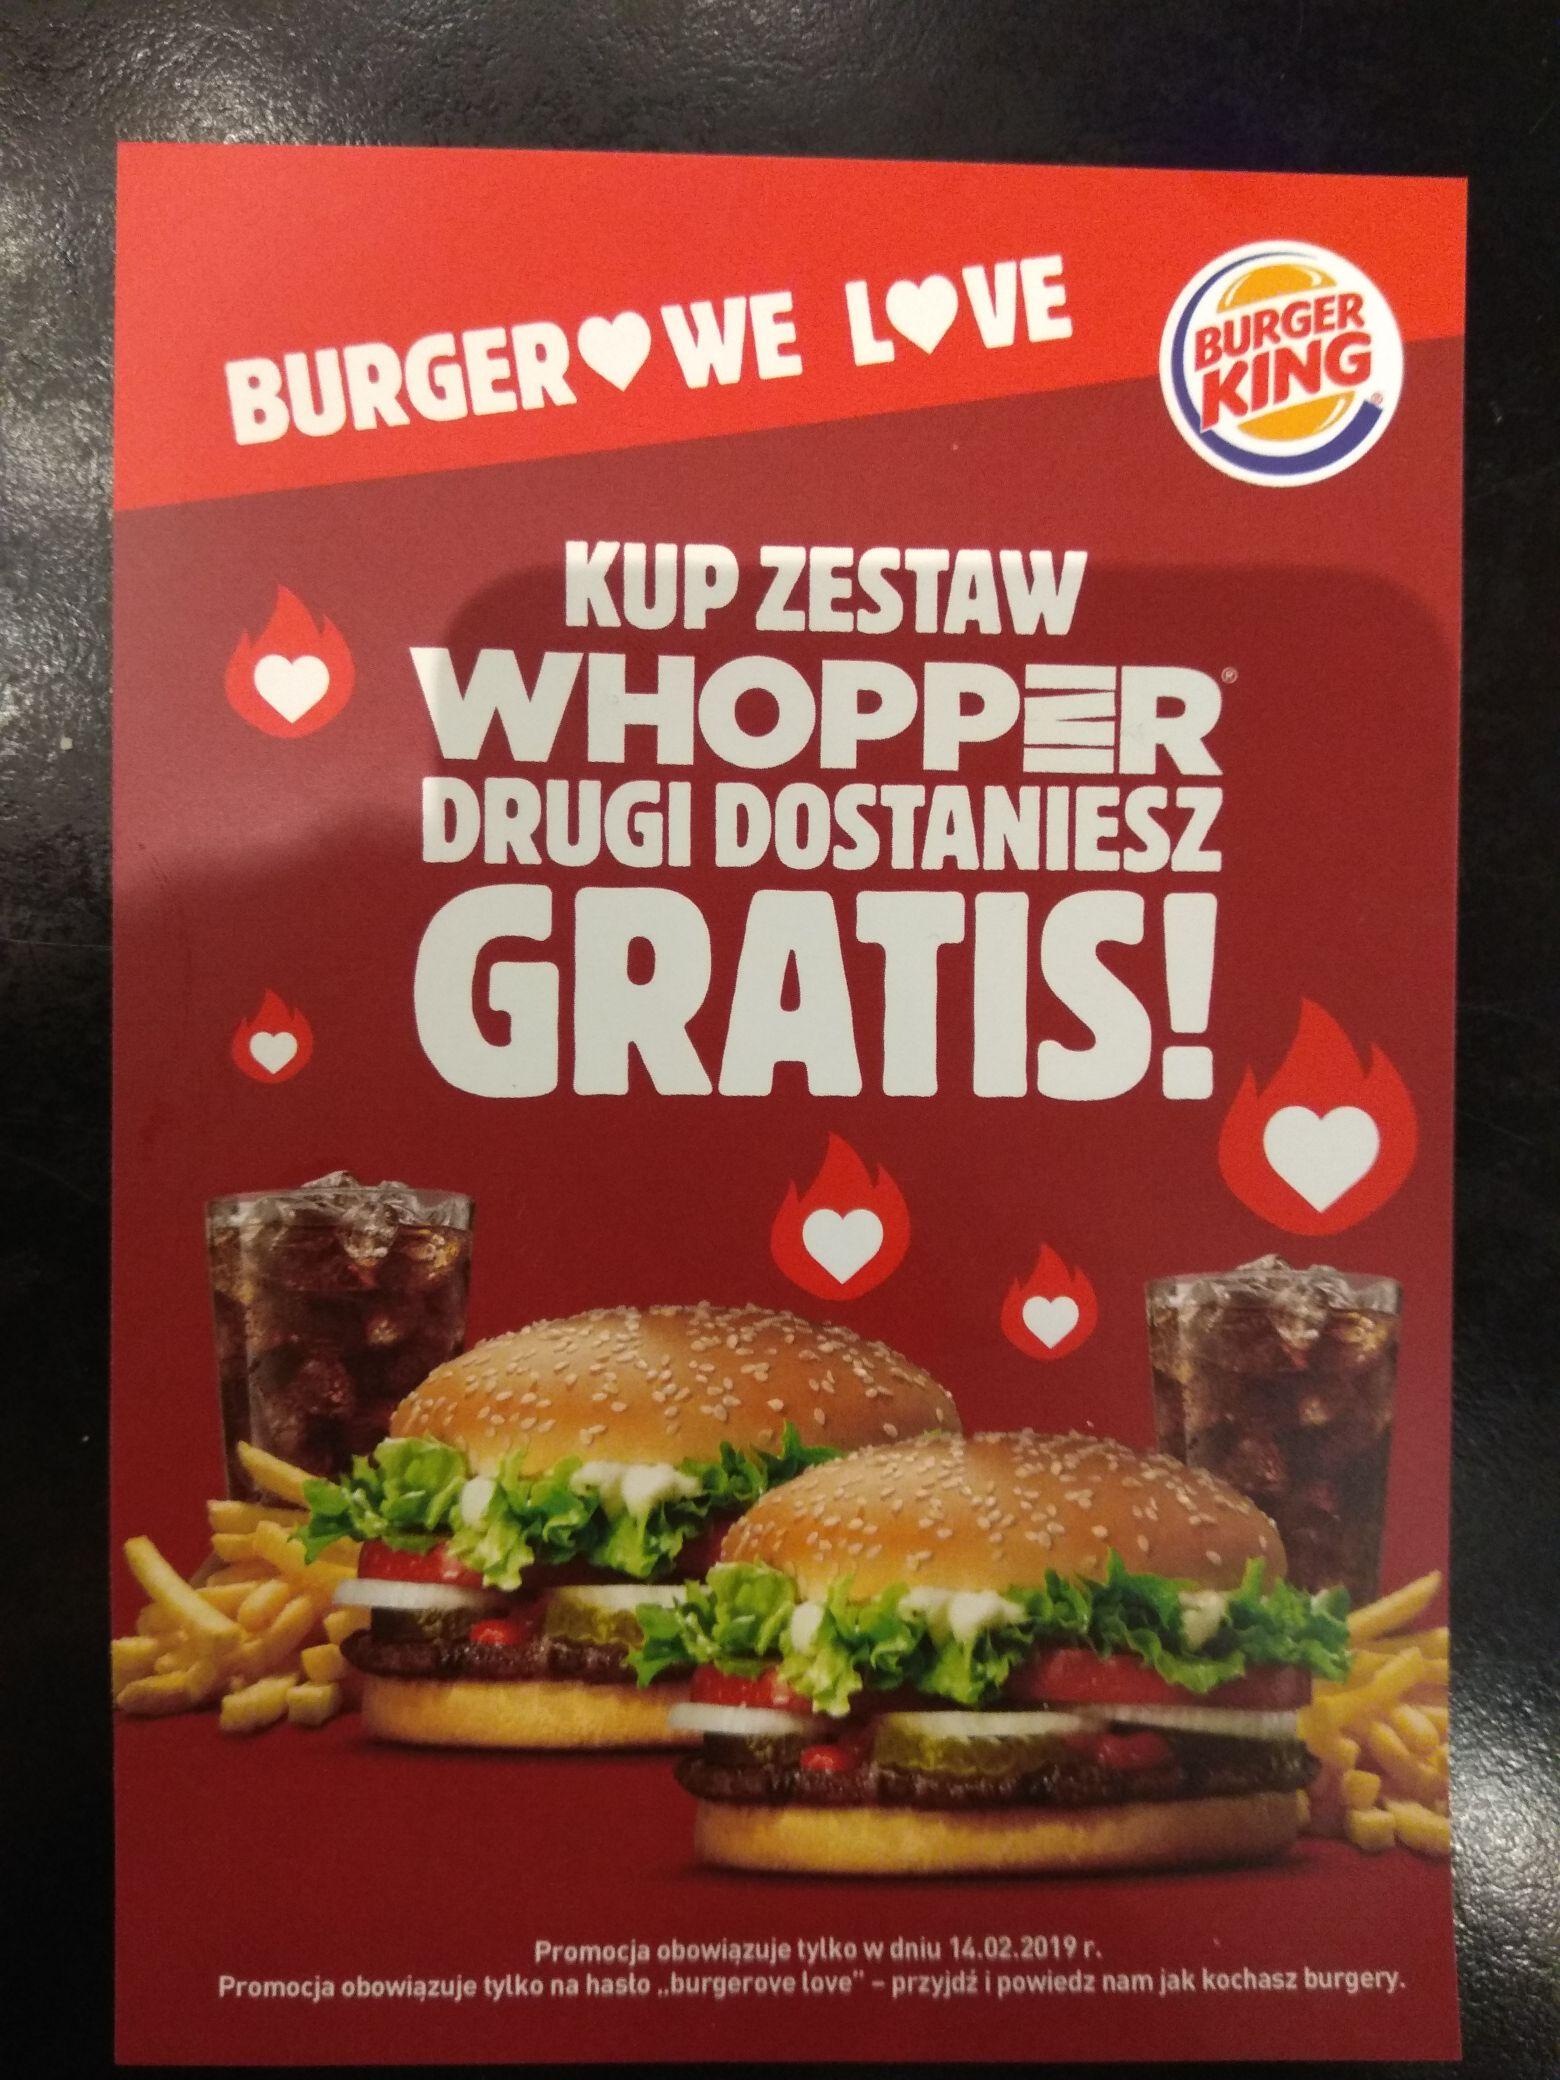 BURGER KING, KUP ZESTAW WHOPPER, DRUGI DOSTANIESZ GRATIS